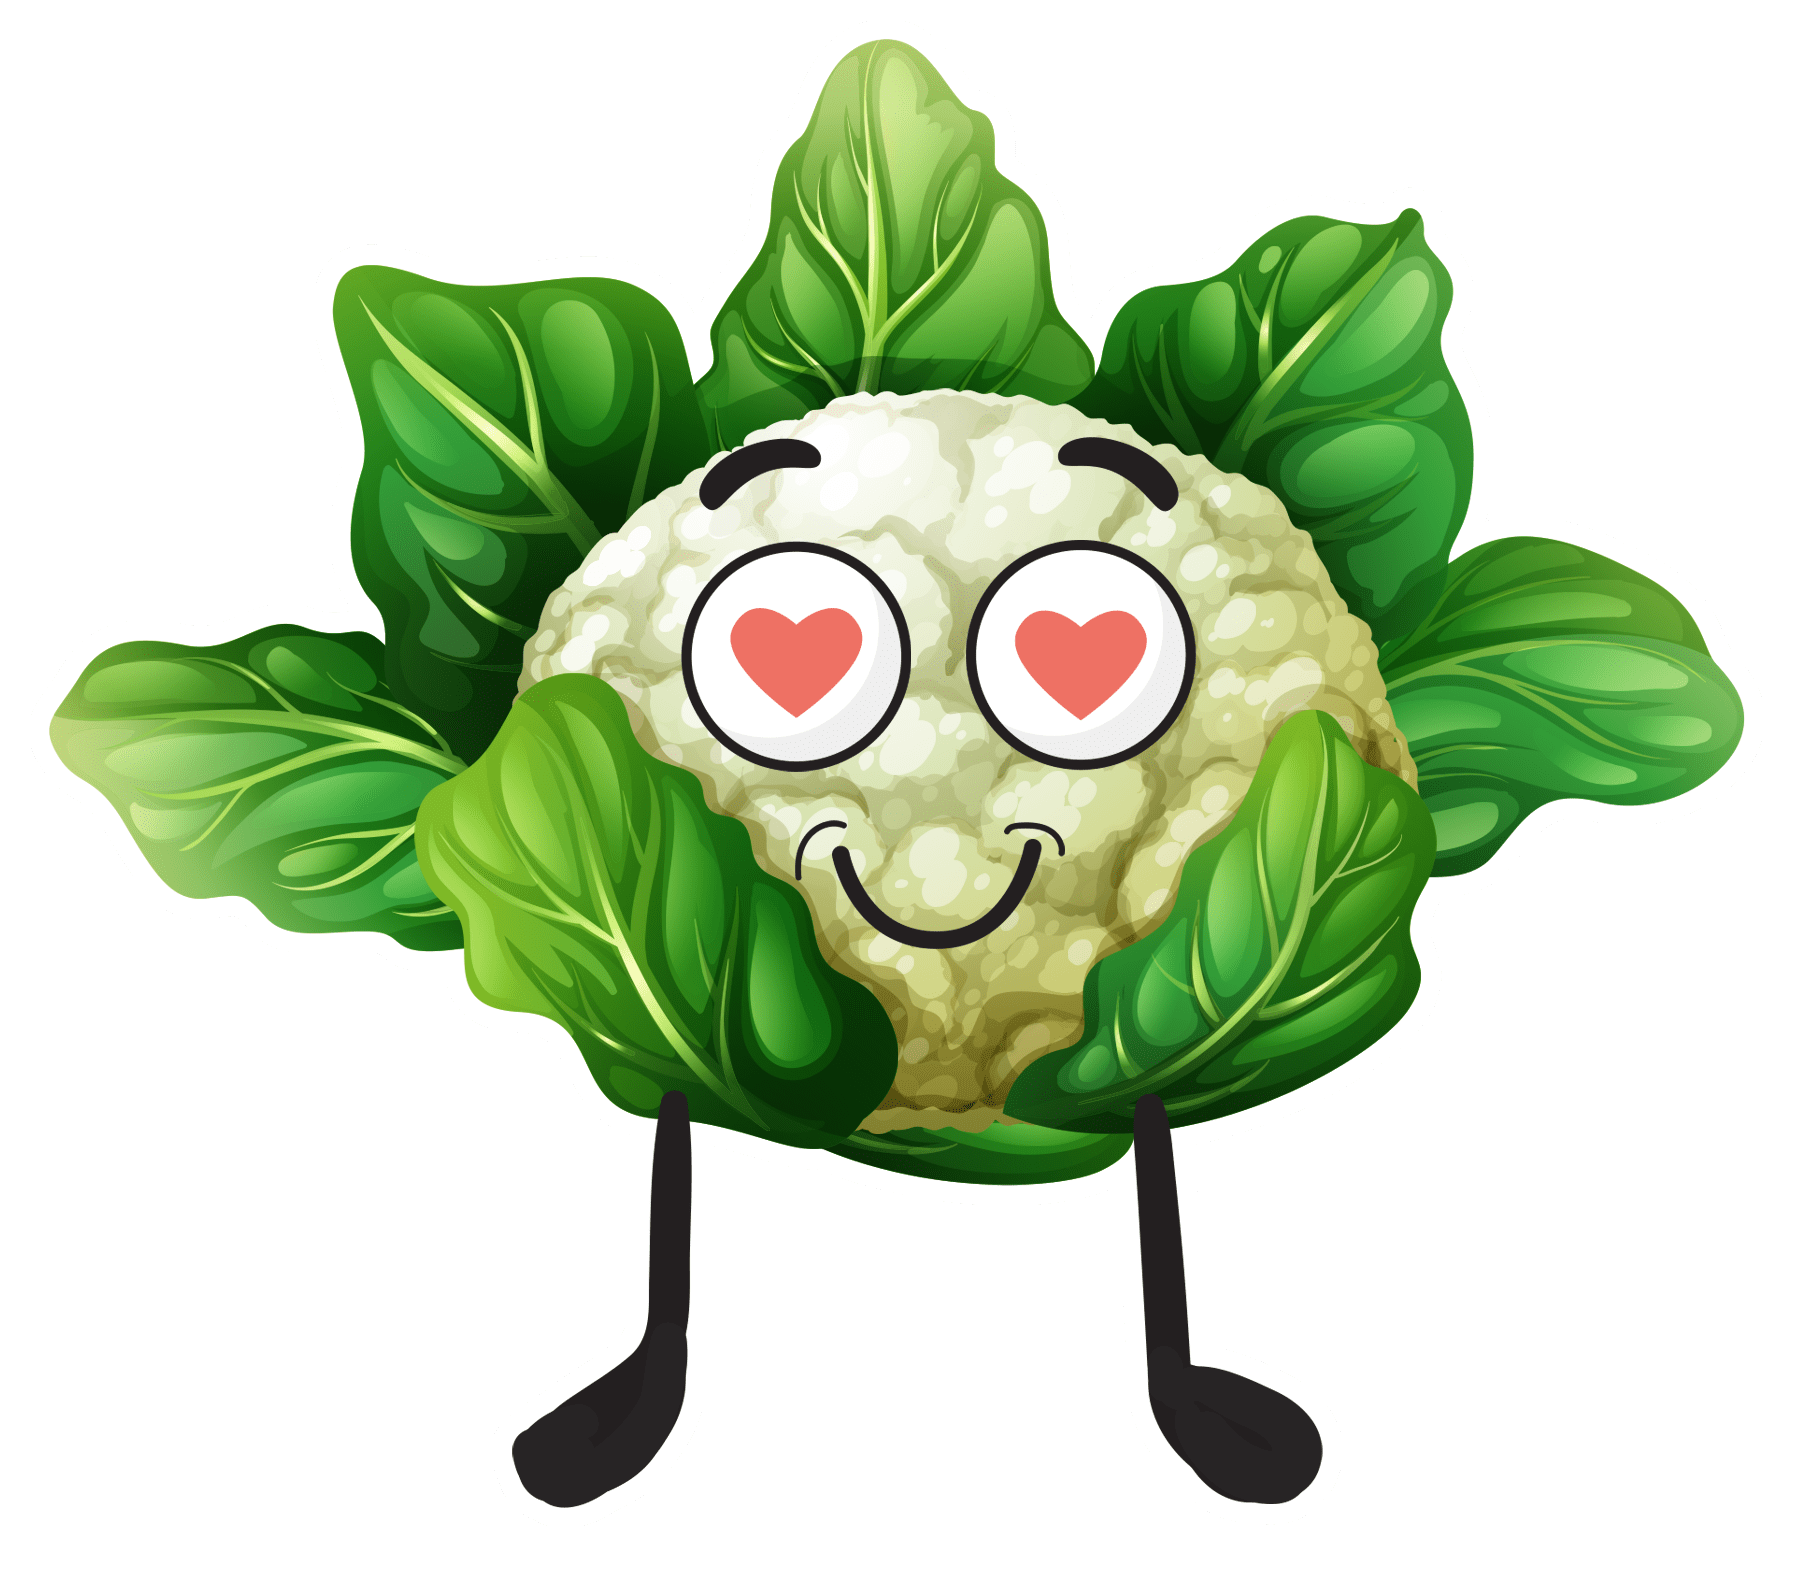 FruityCons messages sticker-6